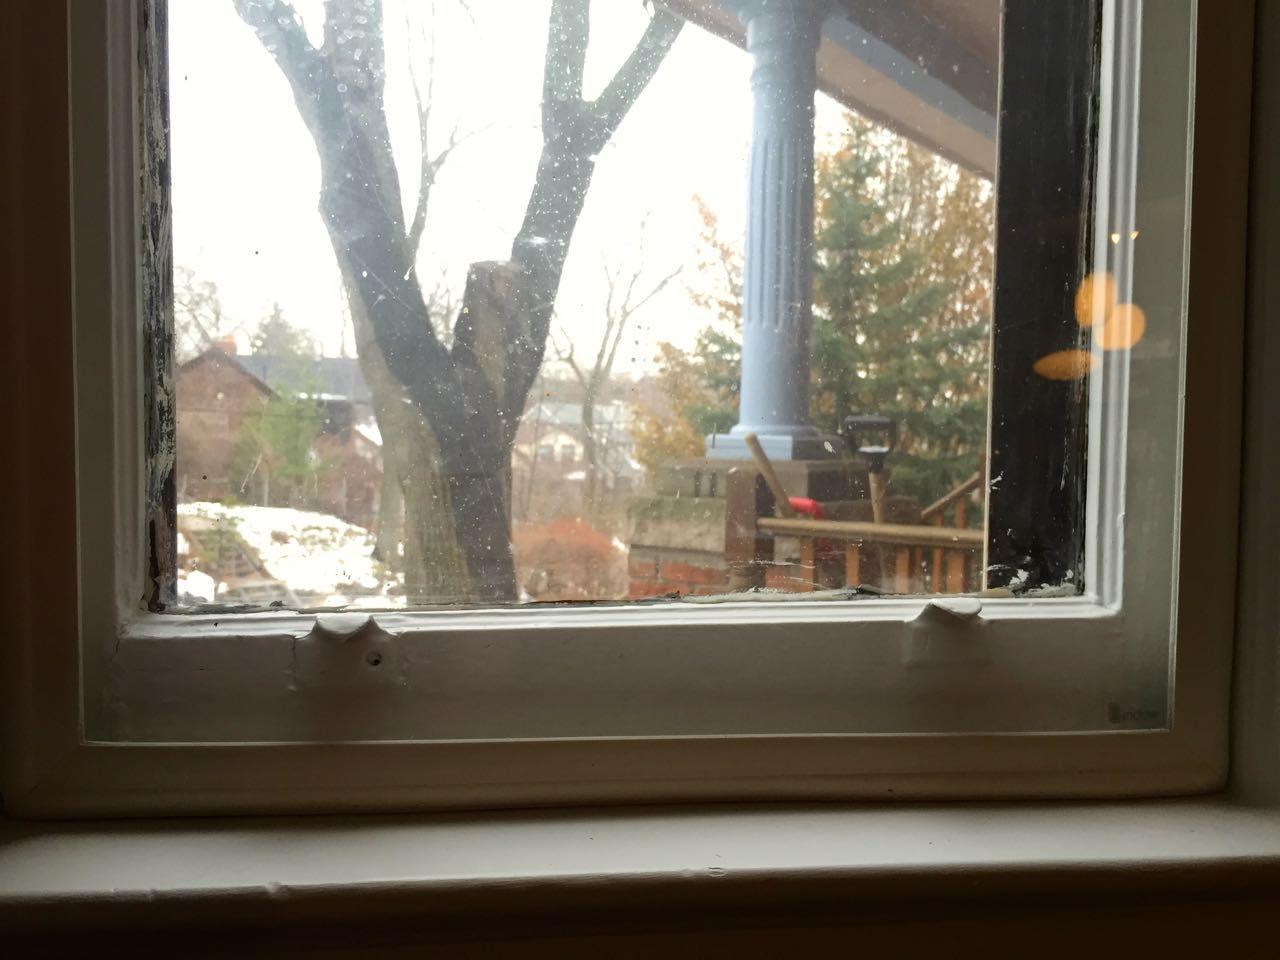 Close up image of windowsill with panel